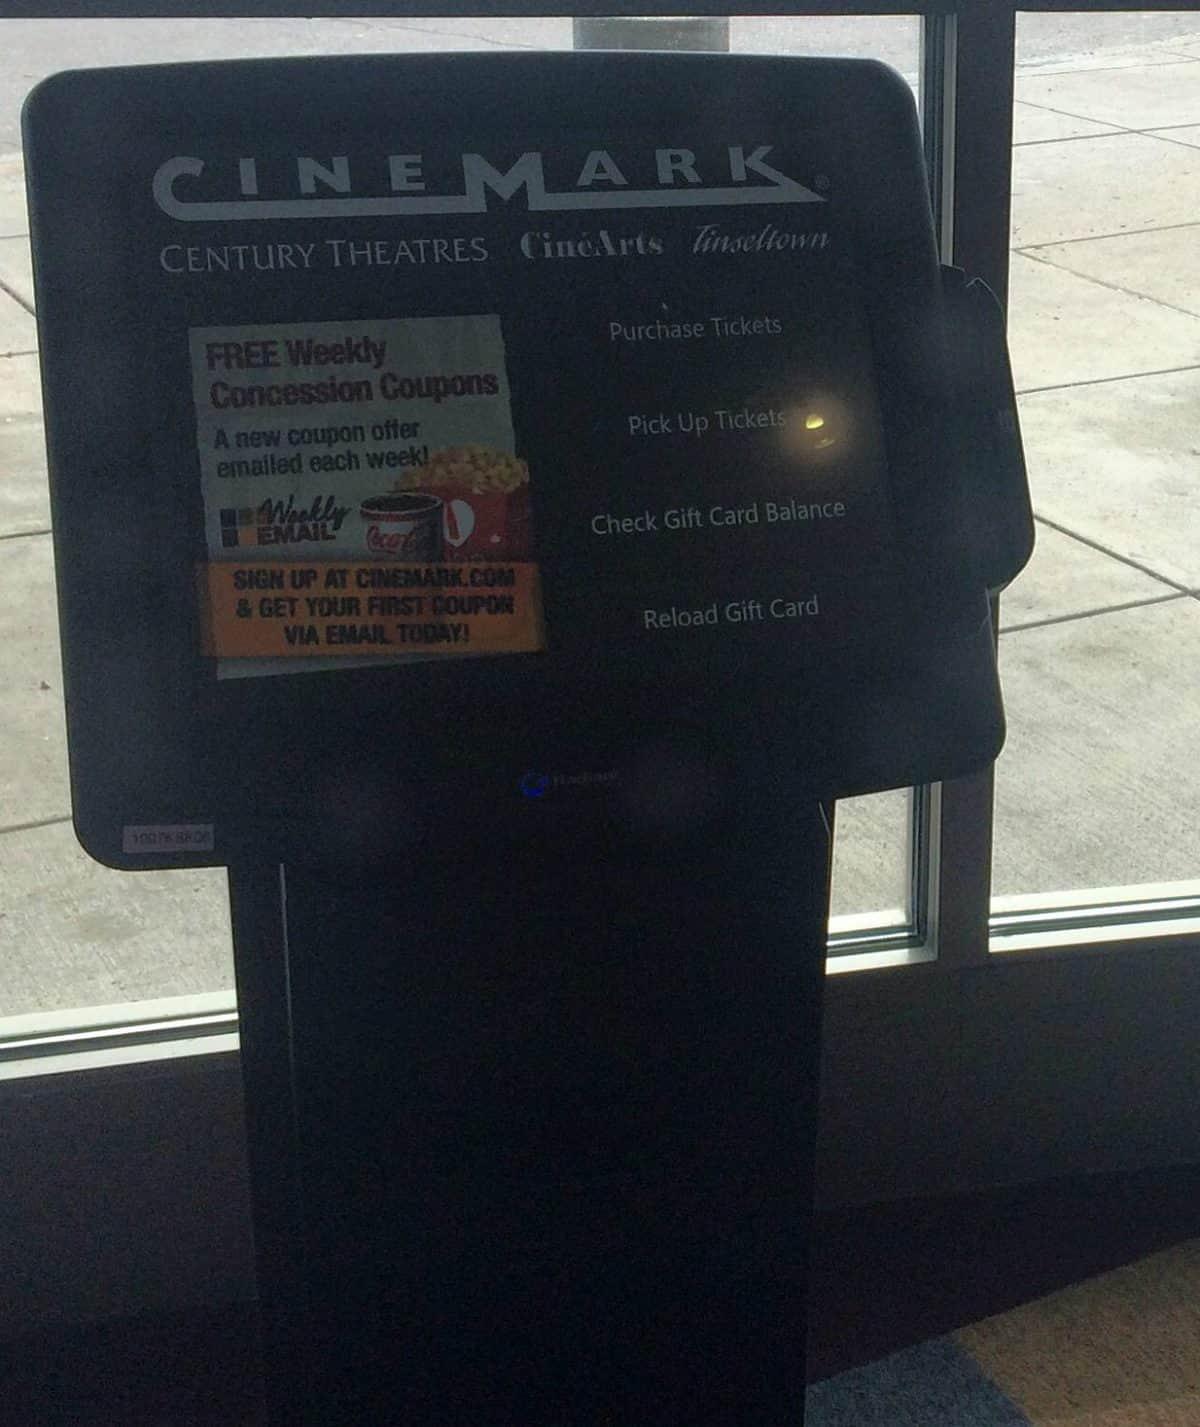 Rave cinemas renovations ann arbor with kids rave ticket kiosk negle Images